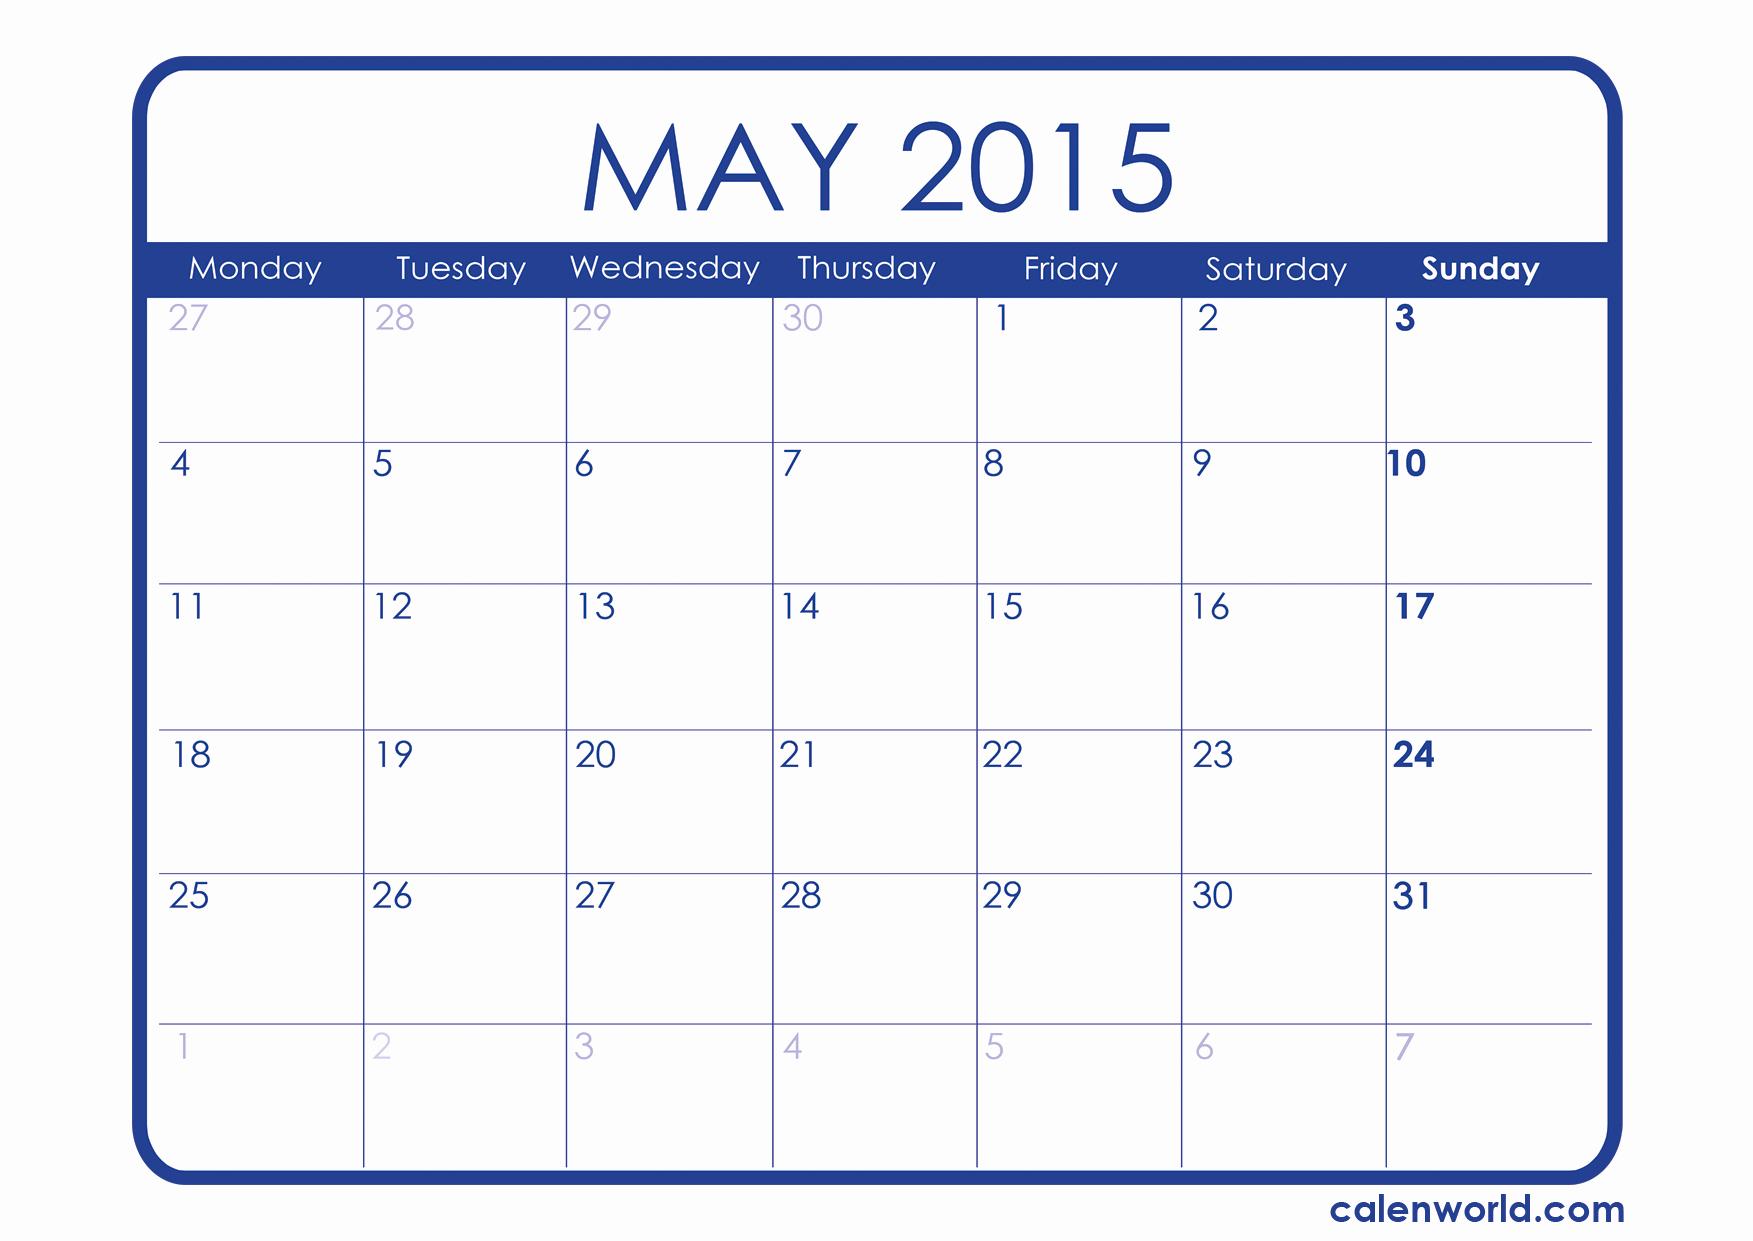 Calendar 2015 Printable with Holidays Elegant May 2015 Calendar